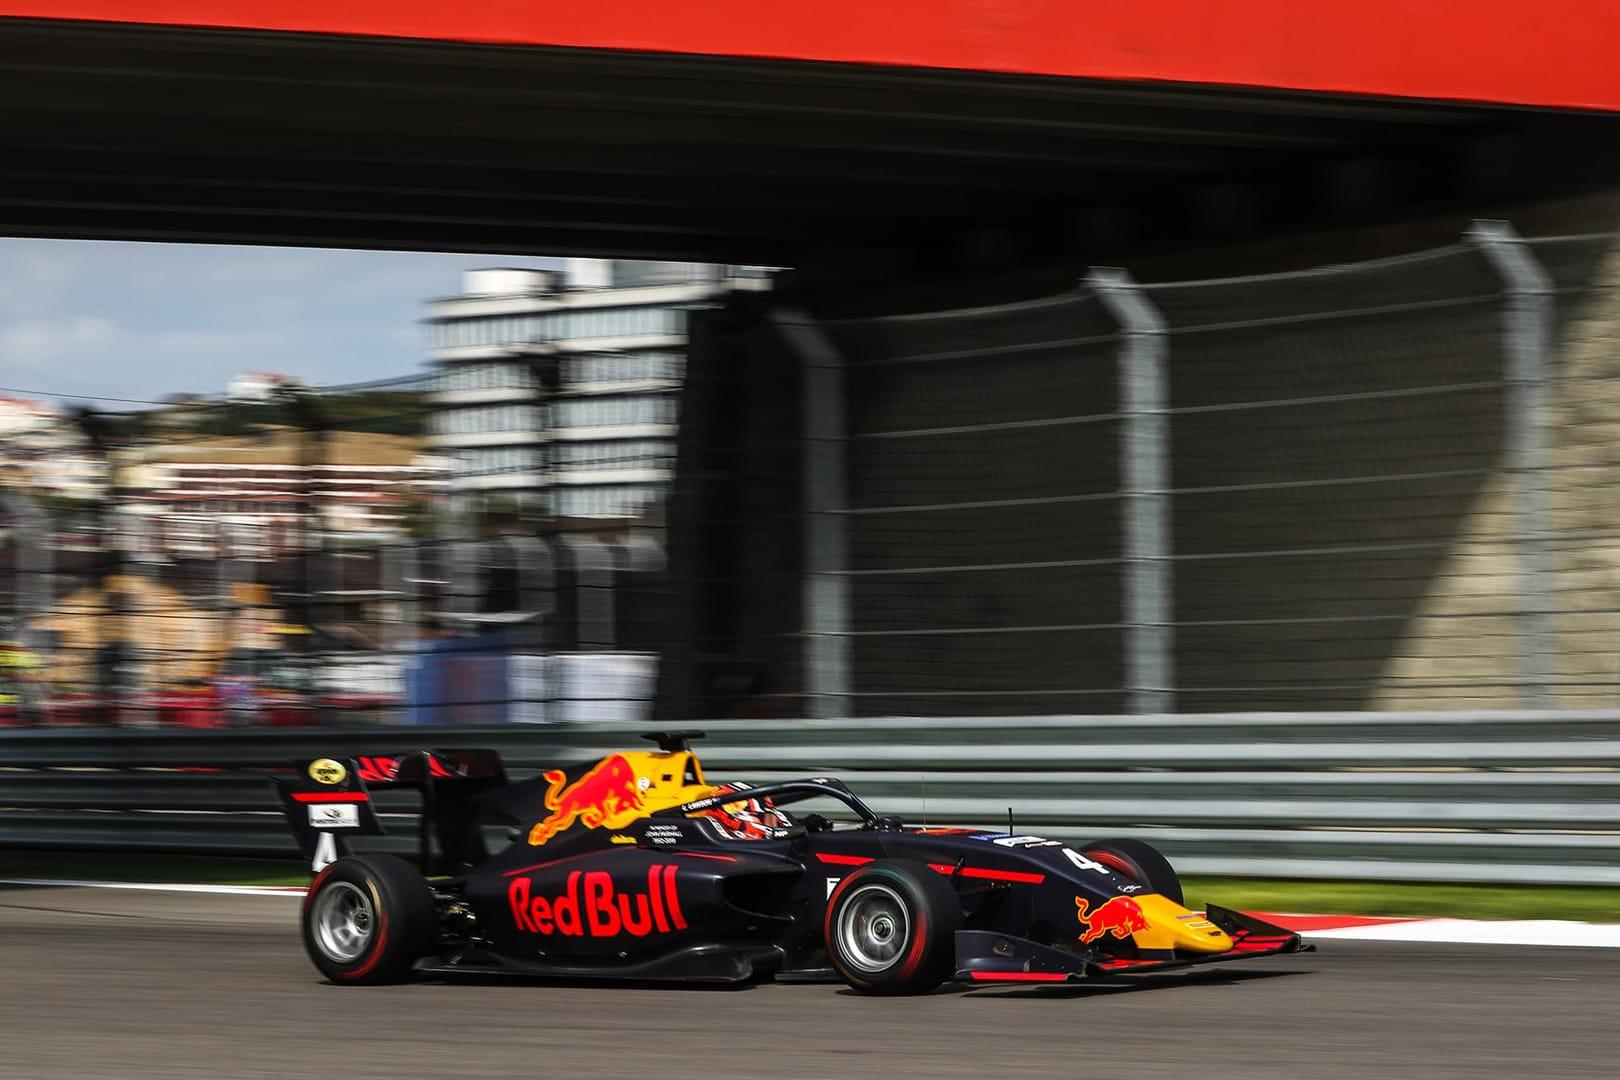 Lawson confirmed for Macau Grand Prix